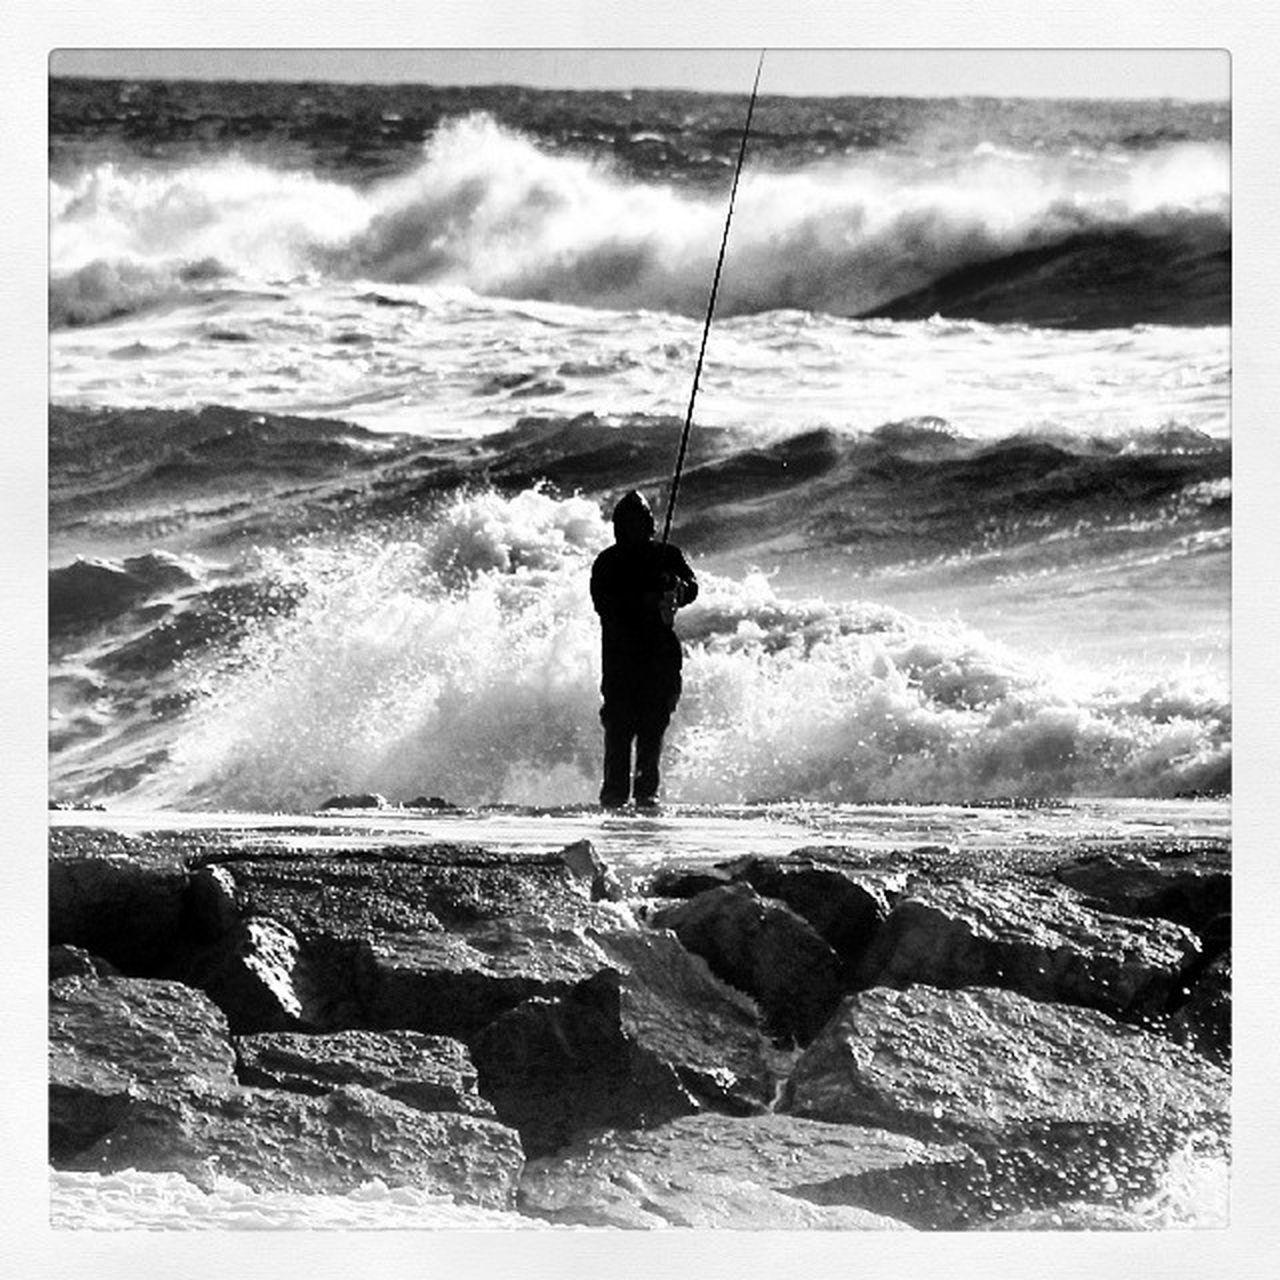 Sem palavrasFisherman Storm Waw Waves portugalmargemsulcostadacaparica